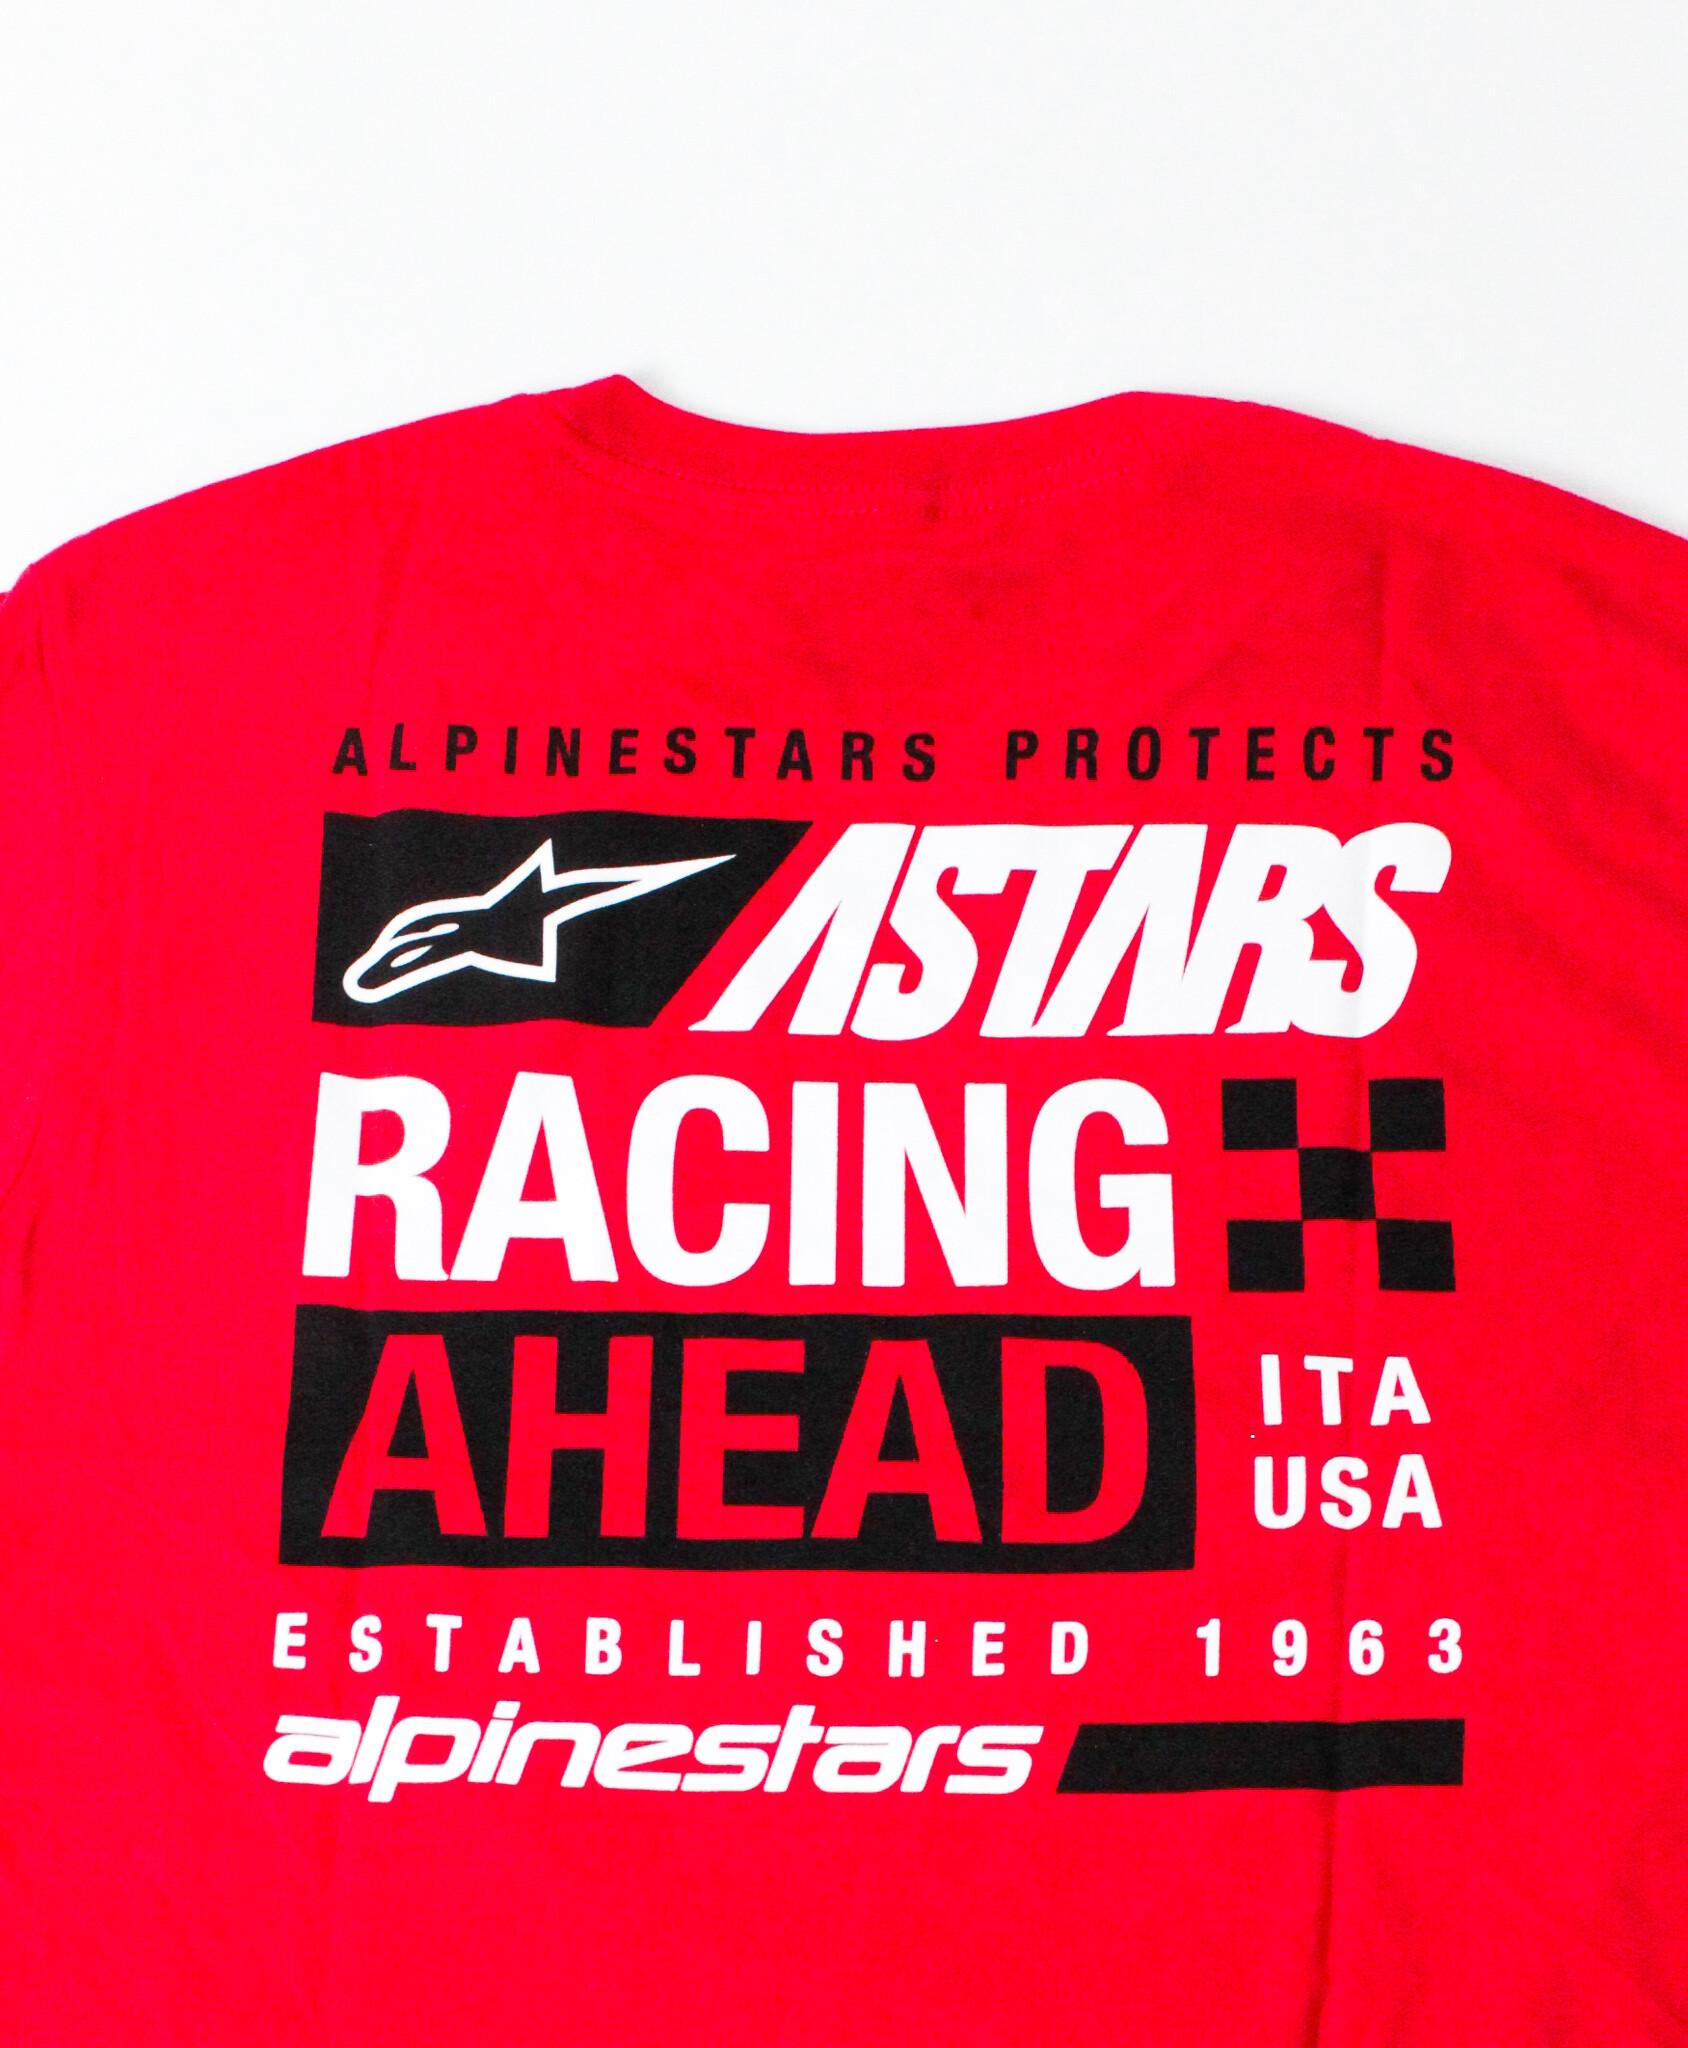 Alpinestars RACING AHEAD Established 1963 - rode mannen Tee